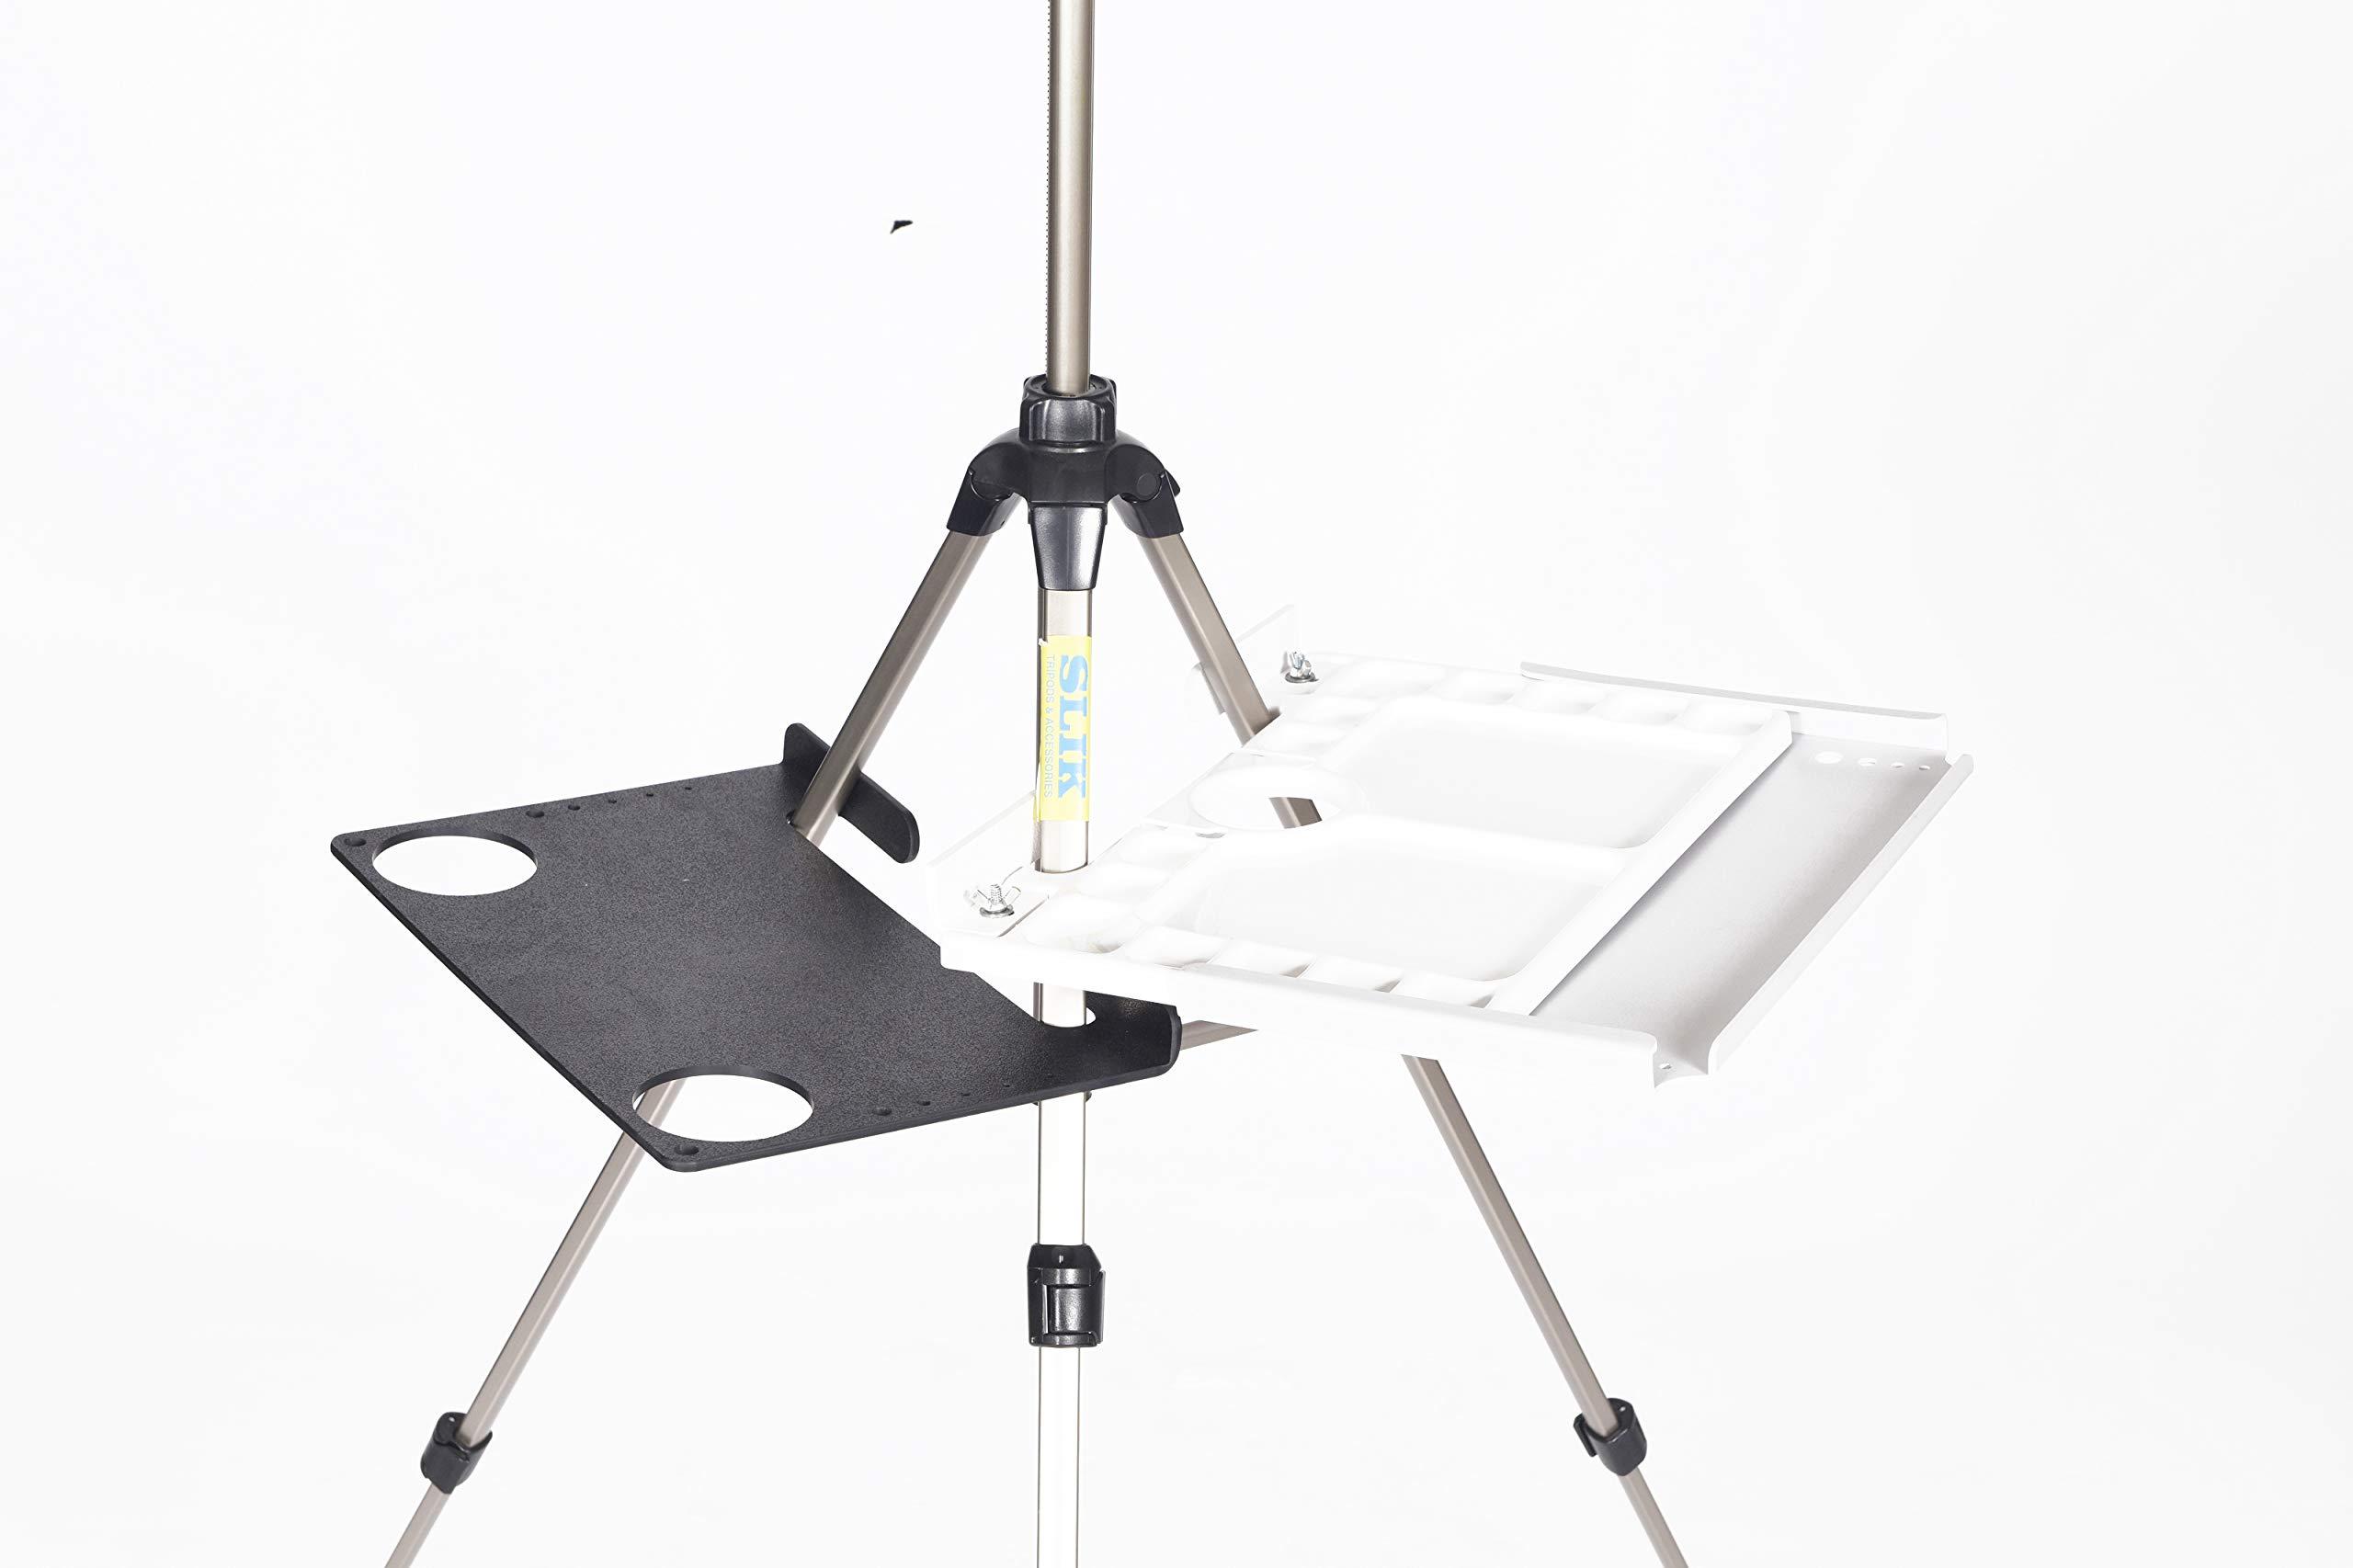 2 Hole Tripod Shelf by En Plein Air Pro